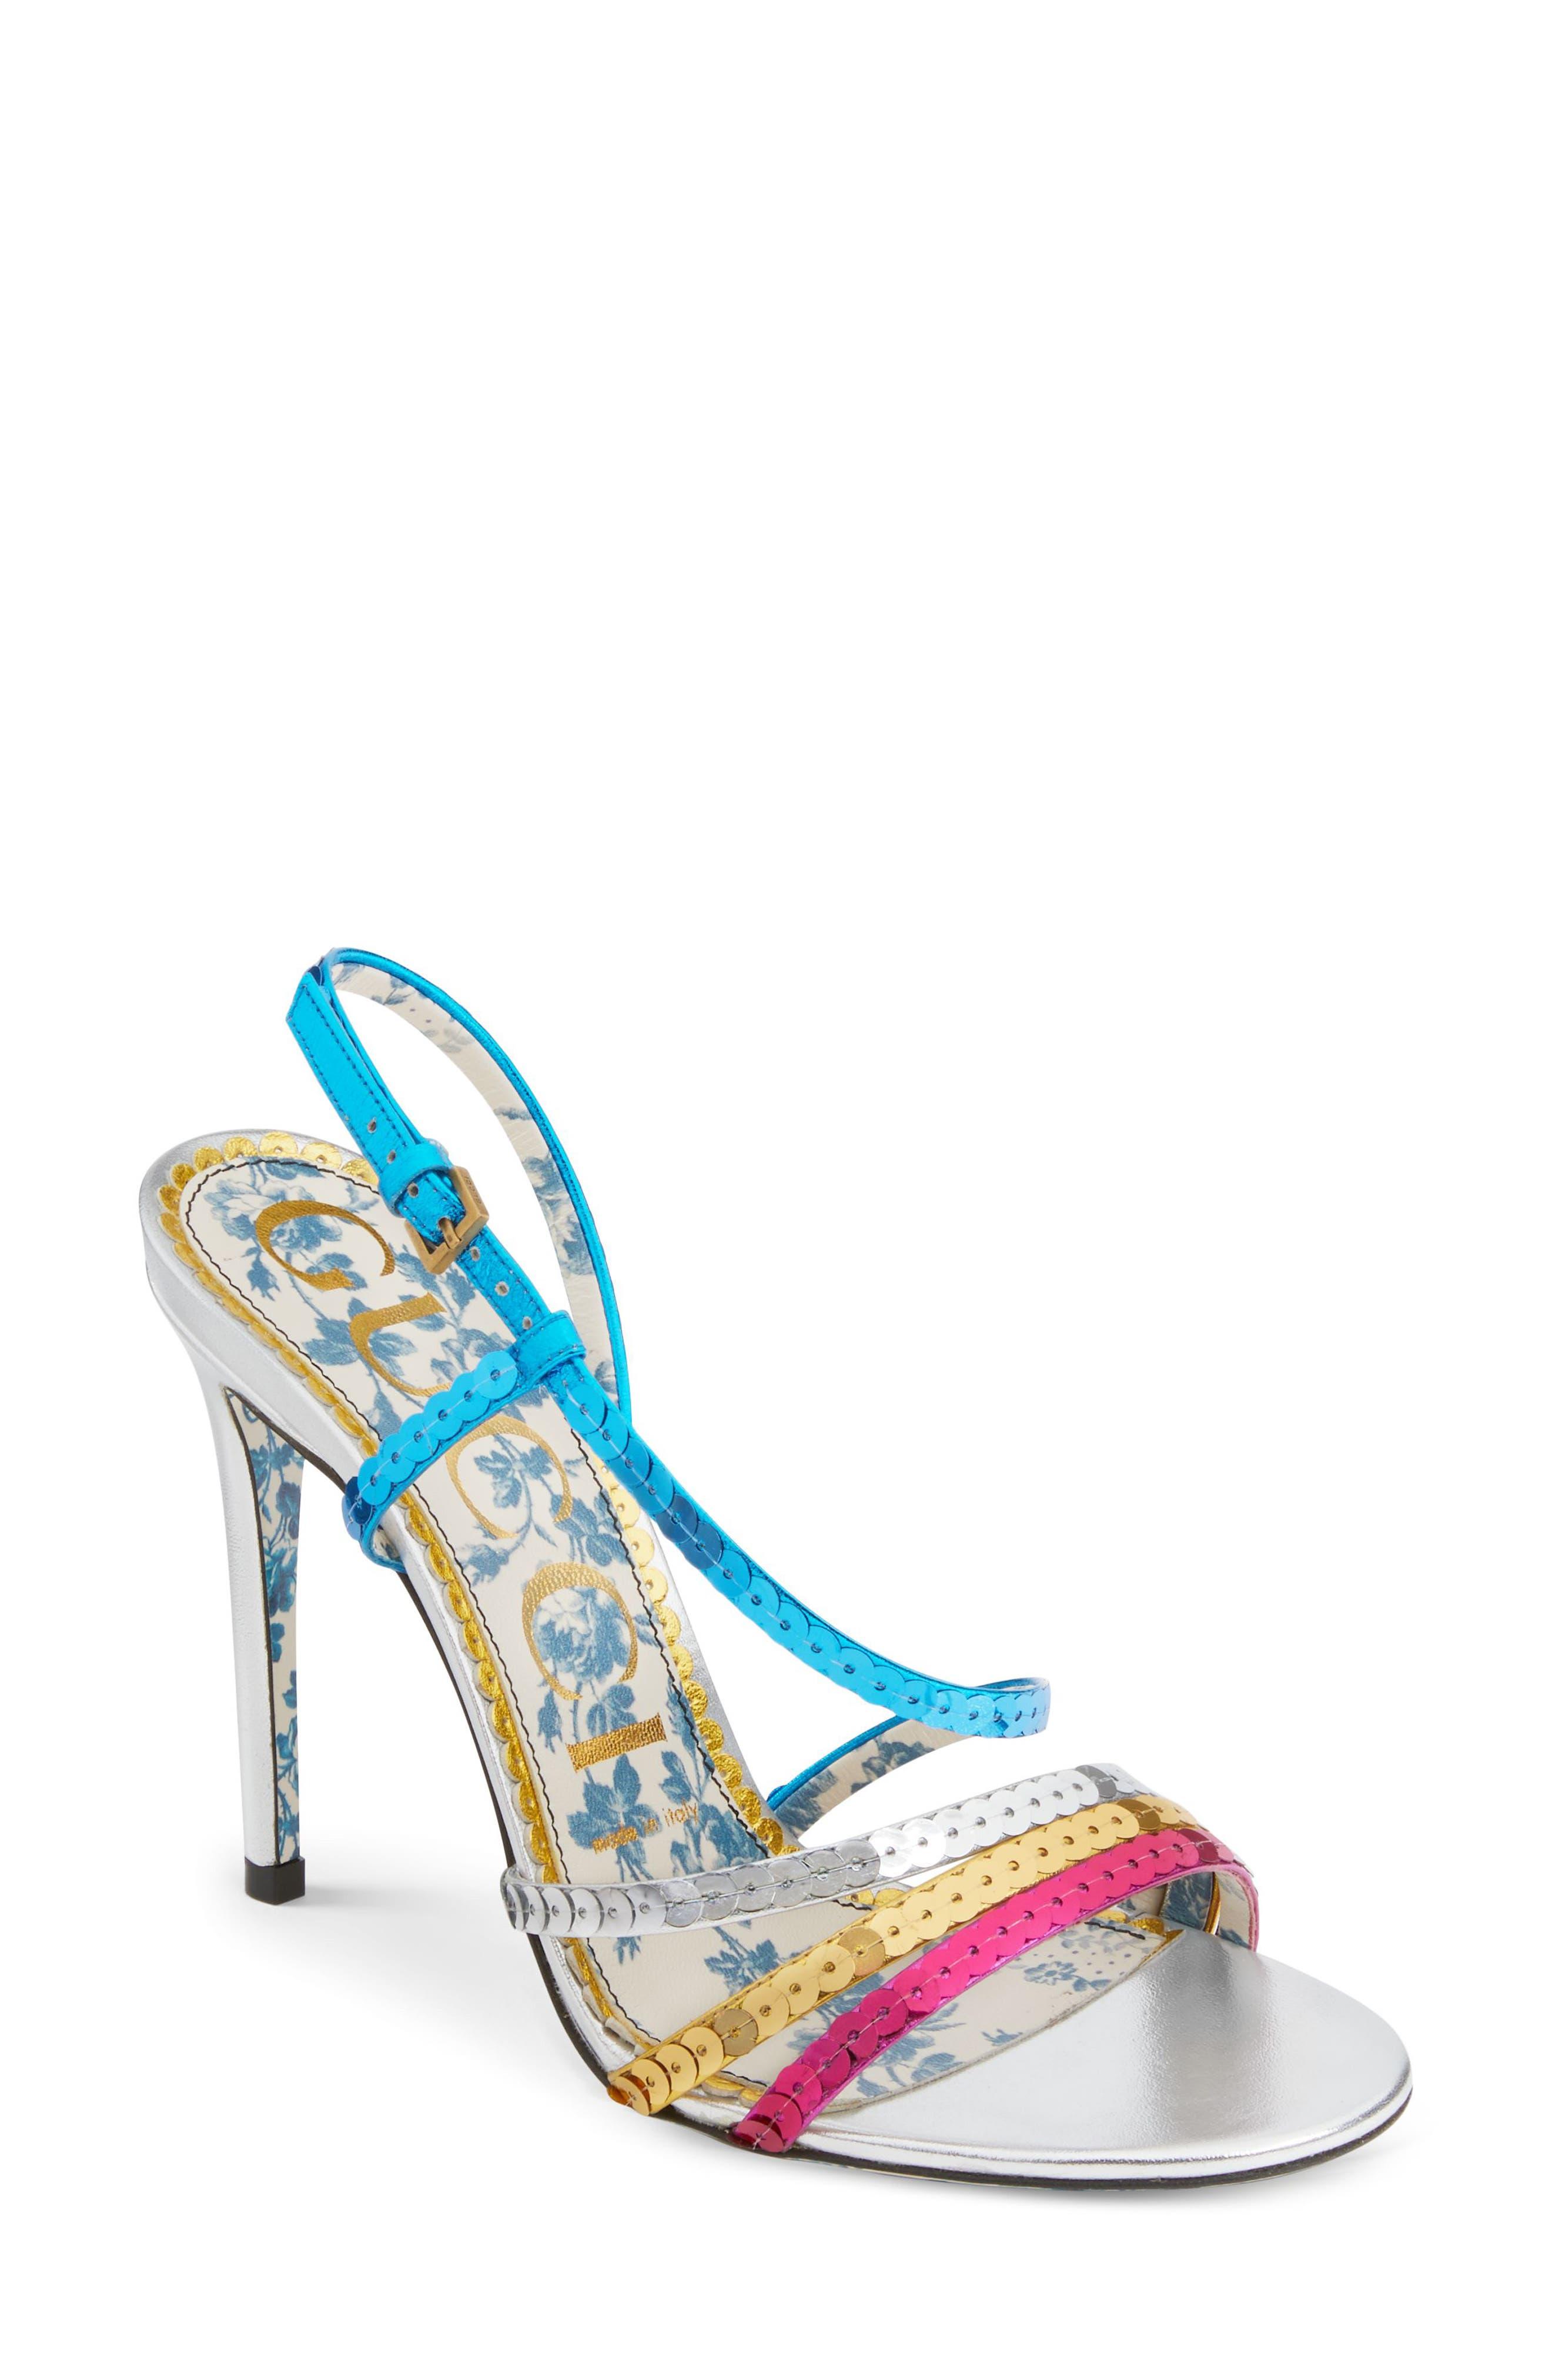 Sequin Sandal,                             Main thumbnail 1, color,                             Silver/ Blue/ Pink